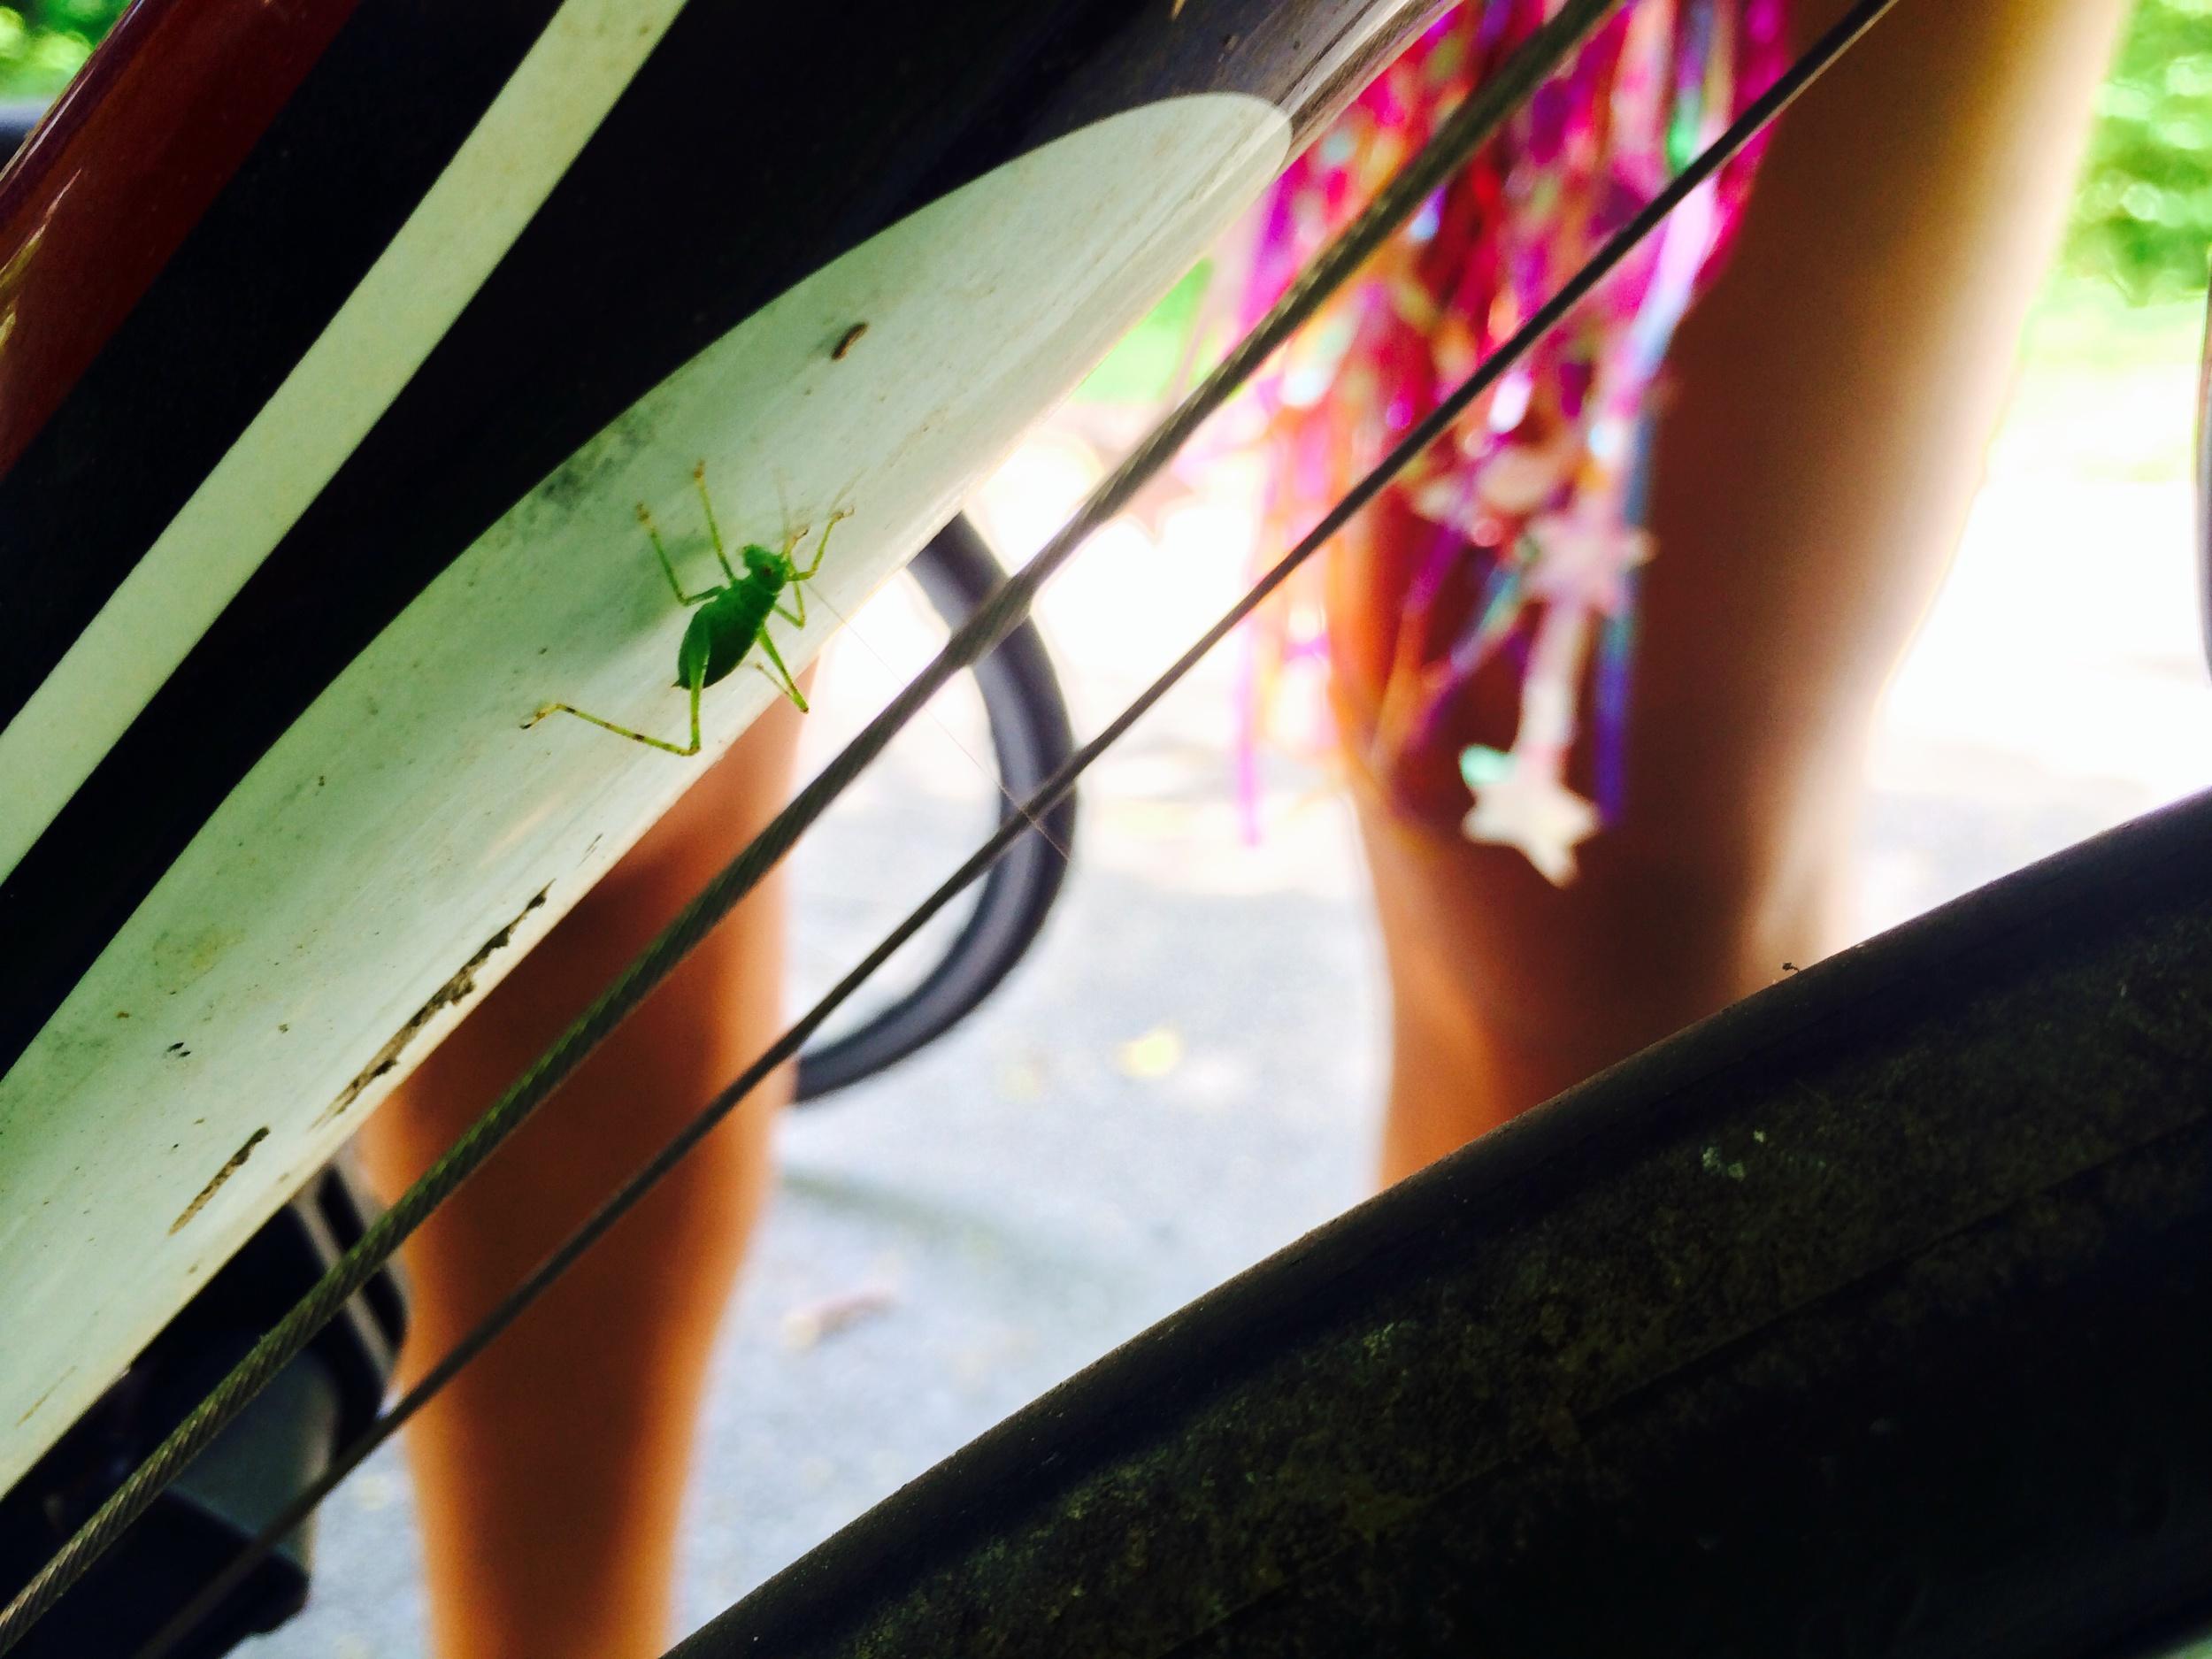 A grasshopper jumped onto my bike!